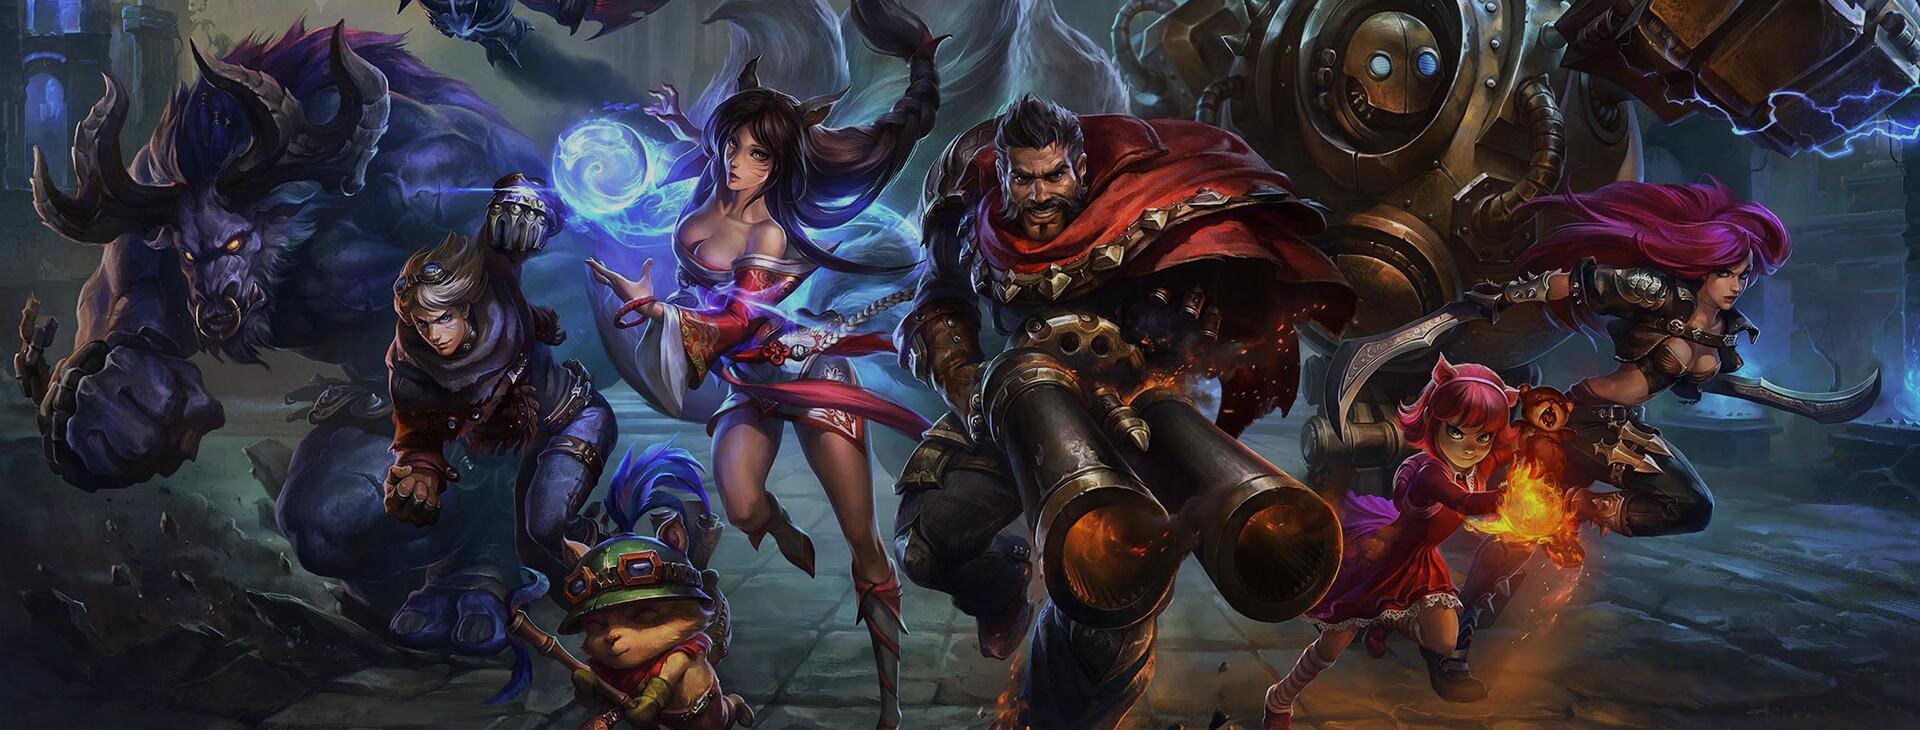 League of Legends - Social creatives, launcher